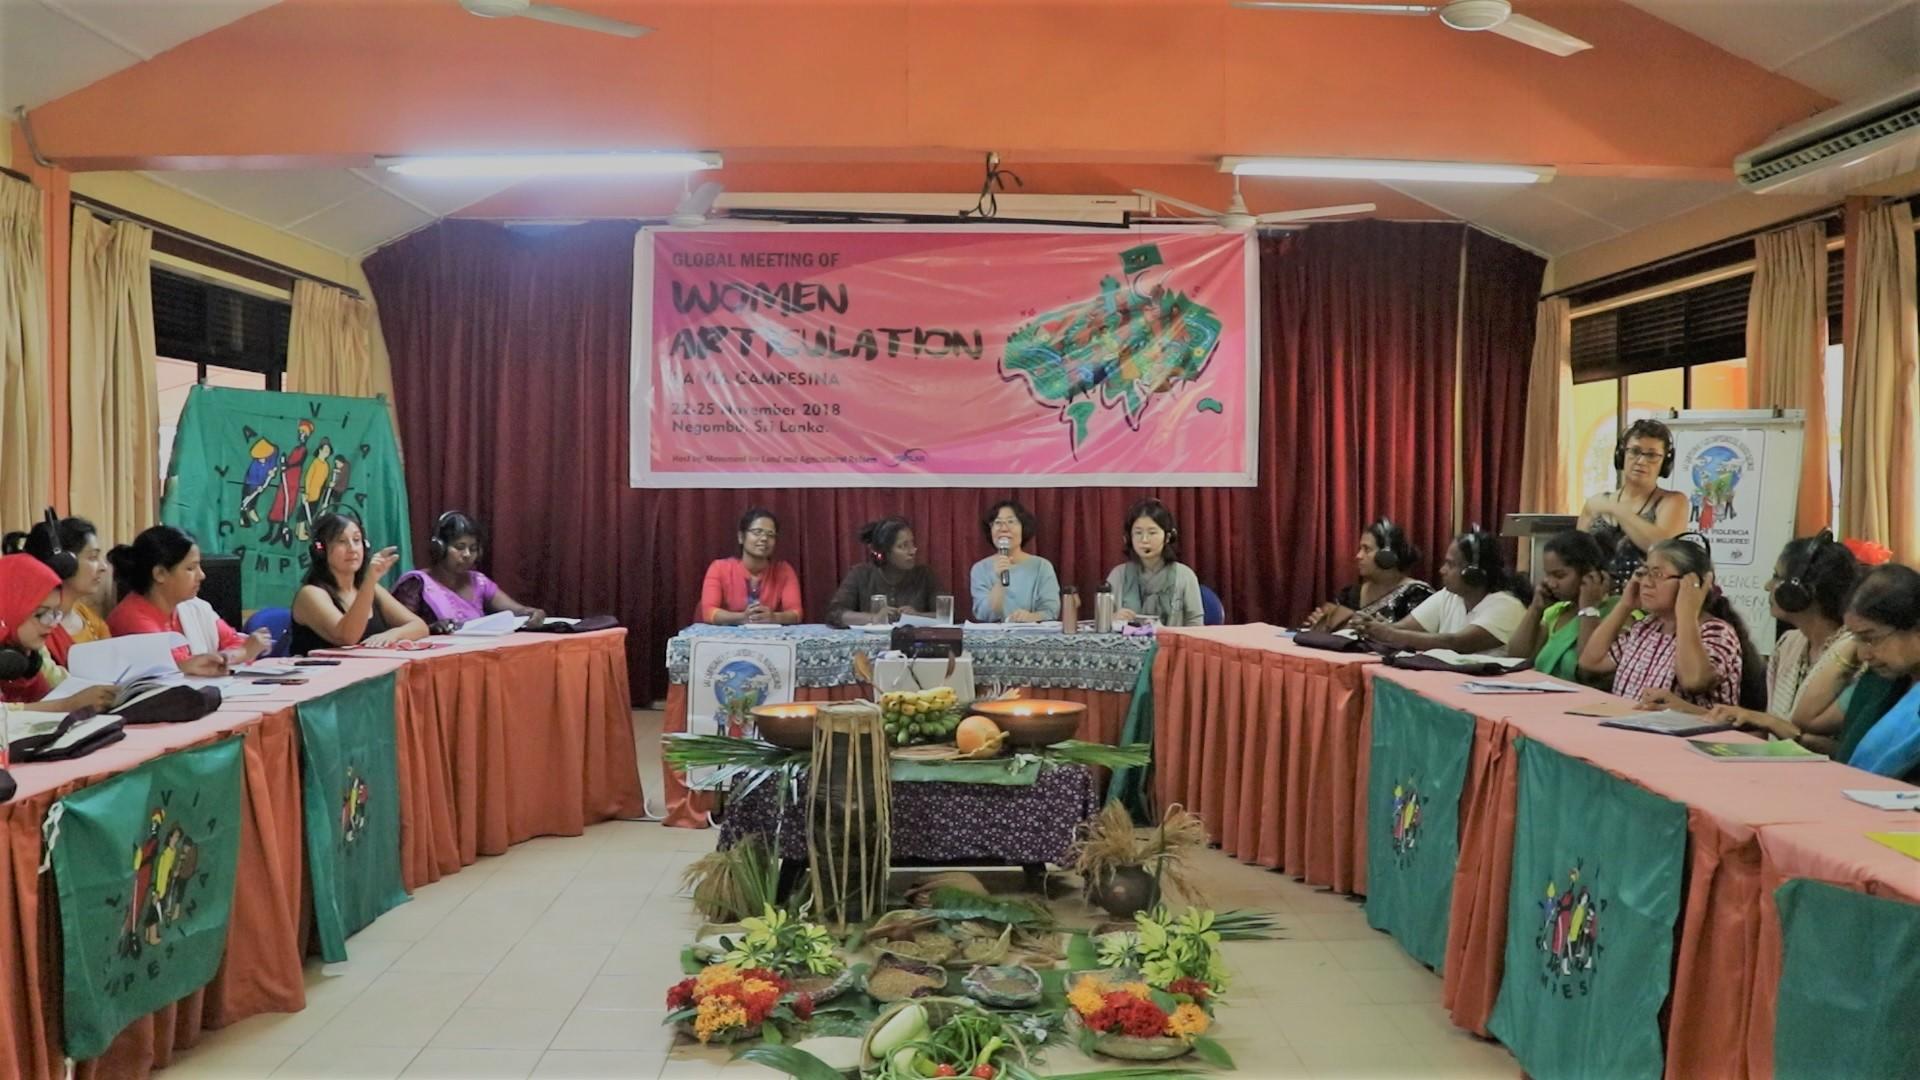 Global Meeting of Women Articulation